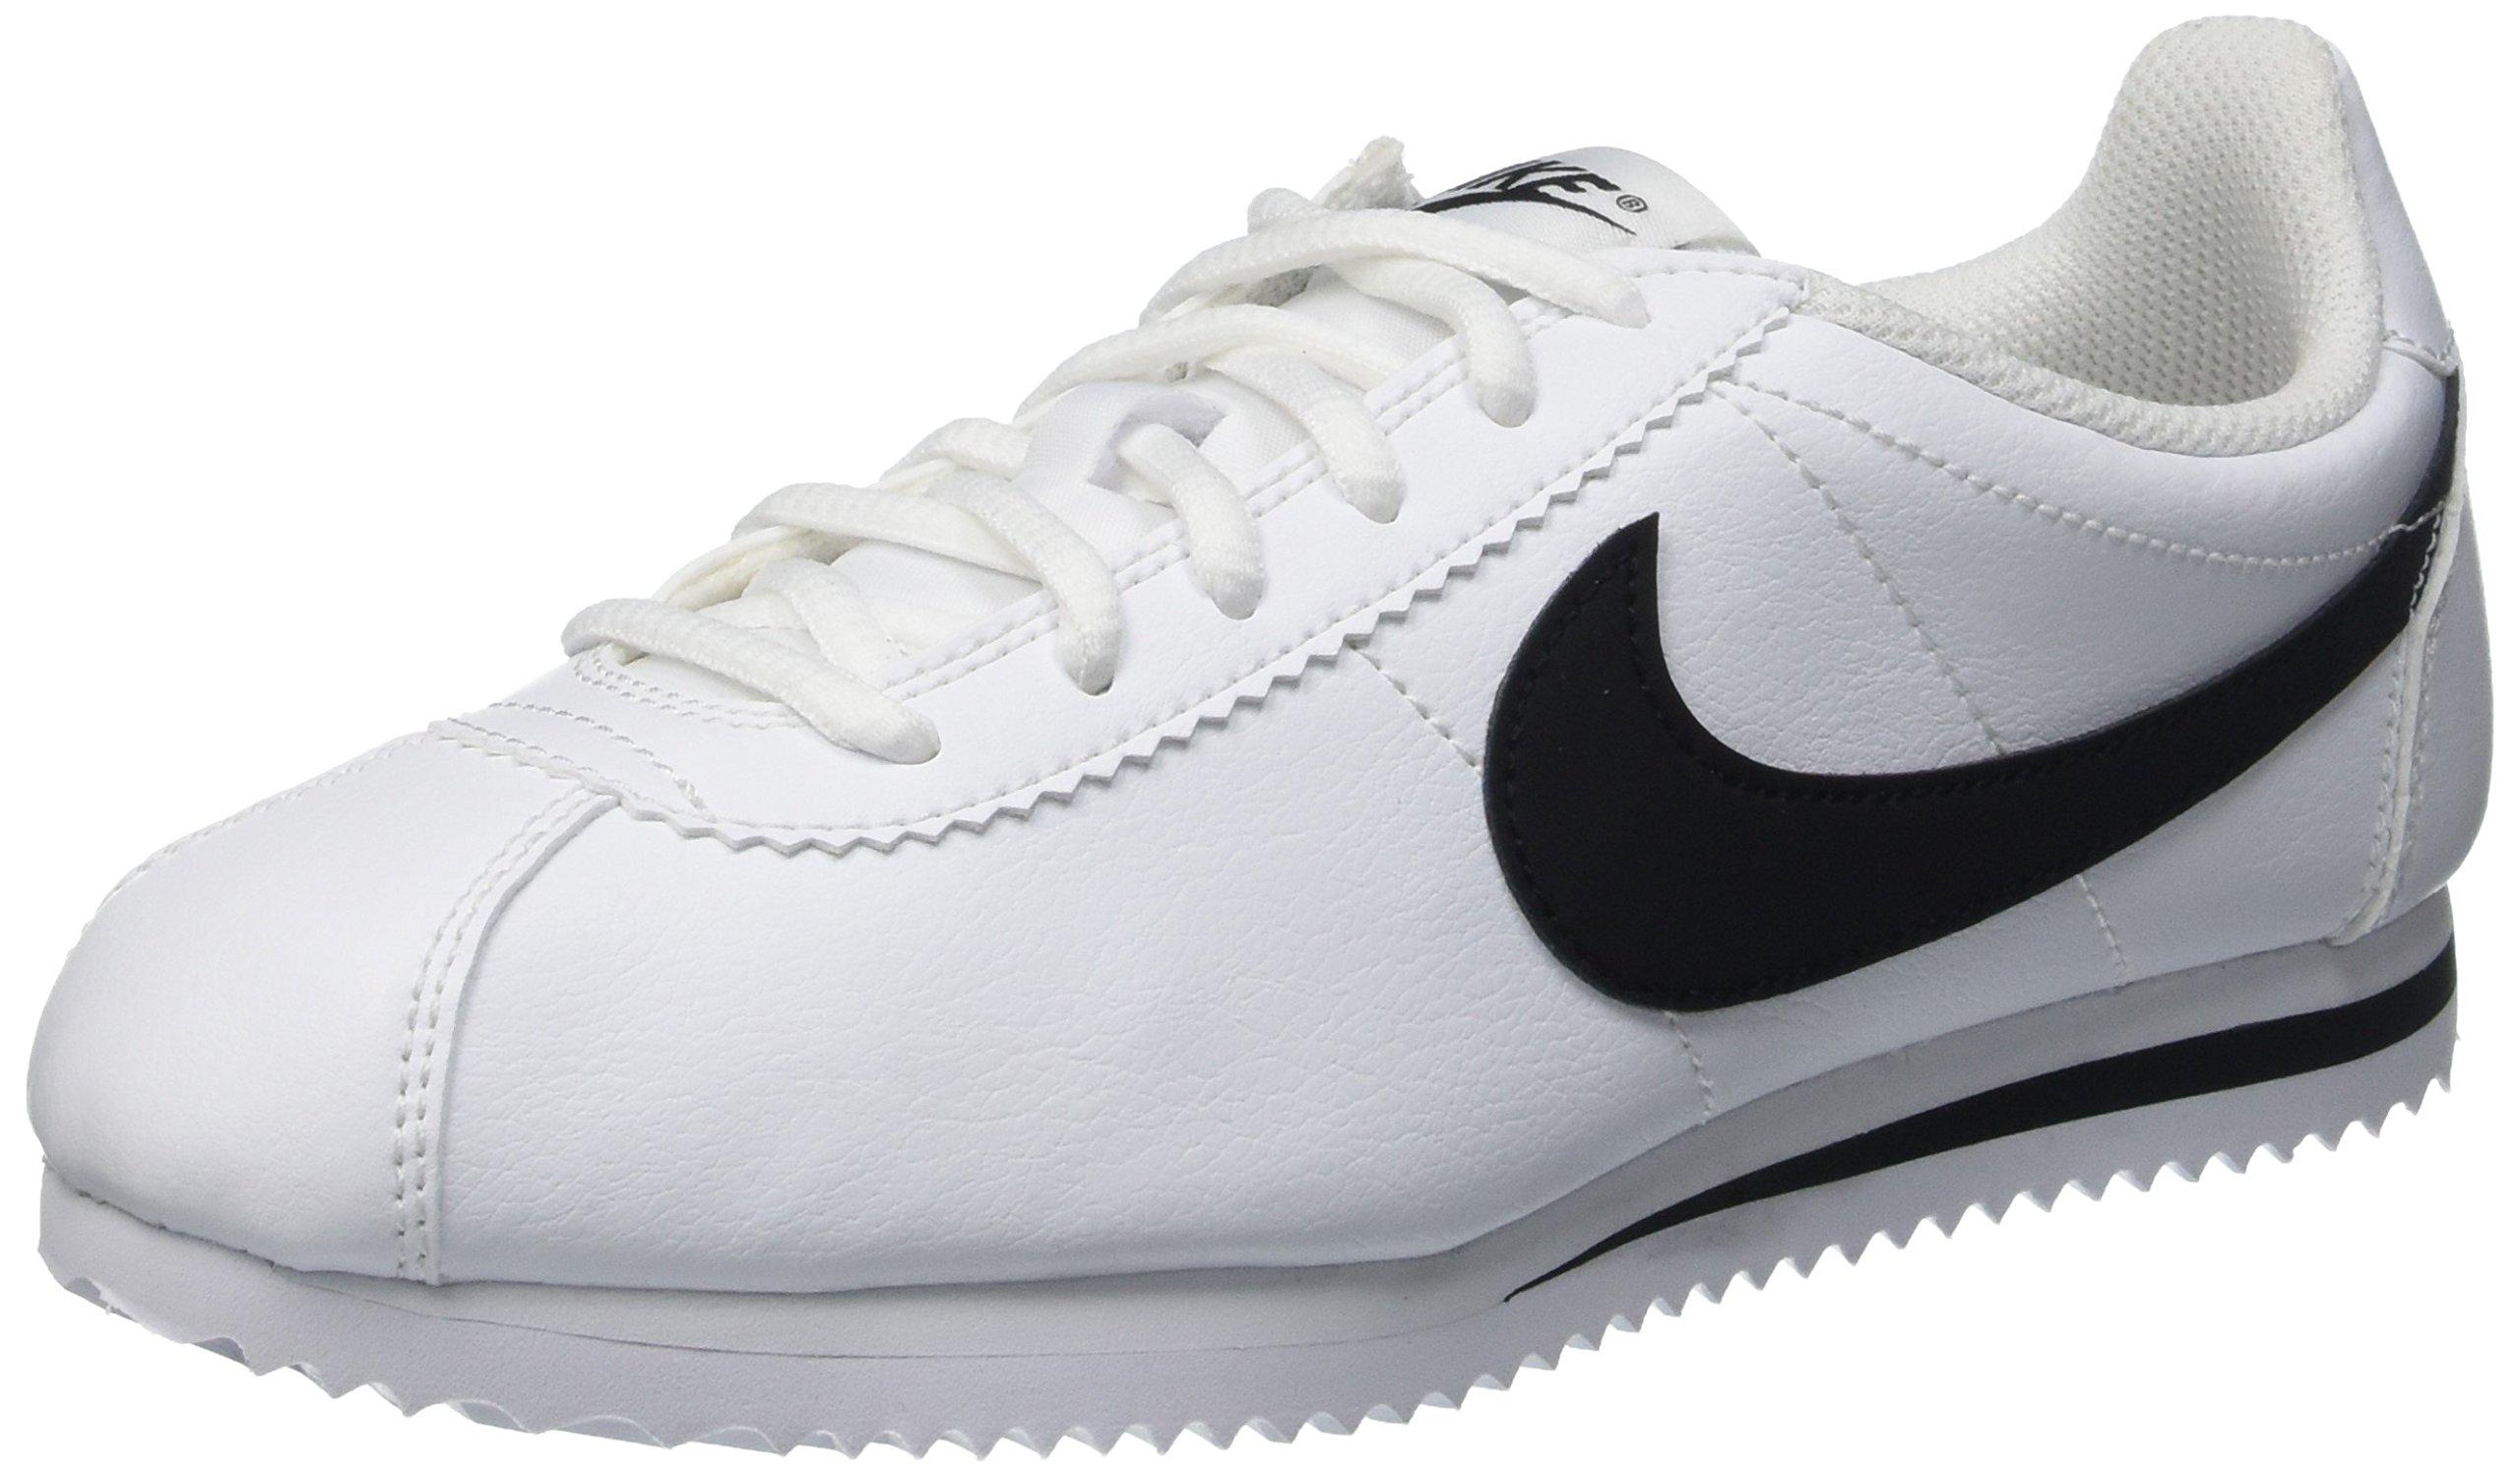 Nike Kids Cortez (GS) White/Black Casual Shoe 4.5 Kids US